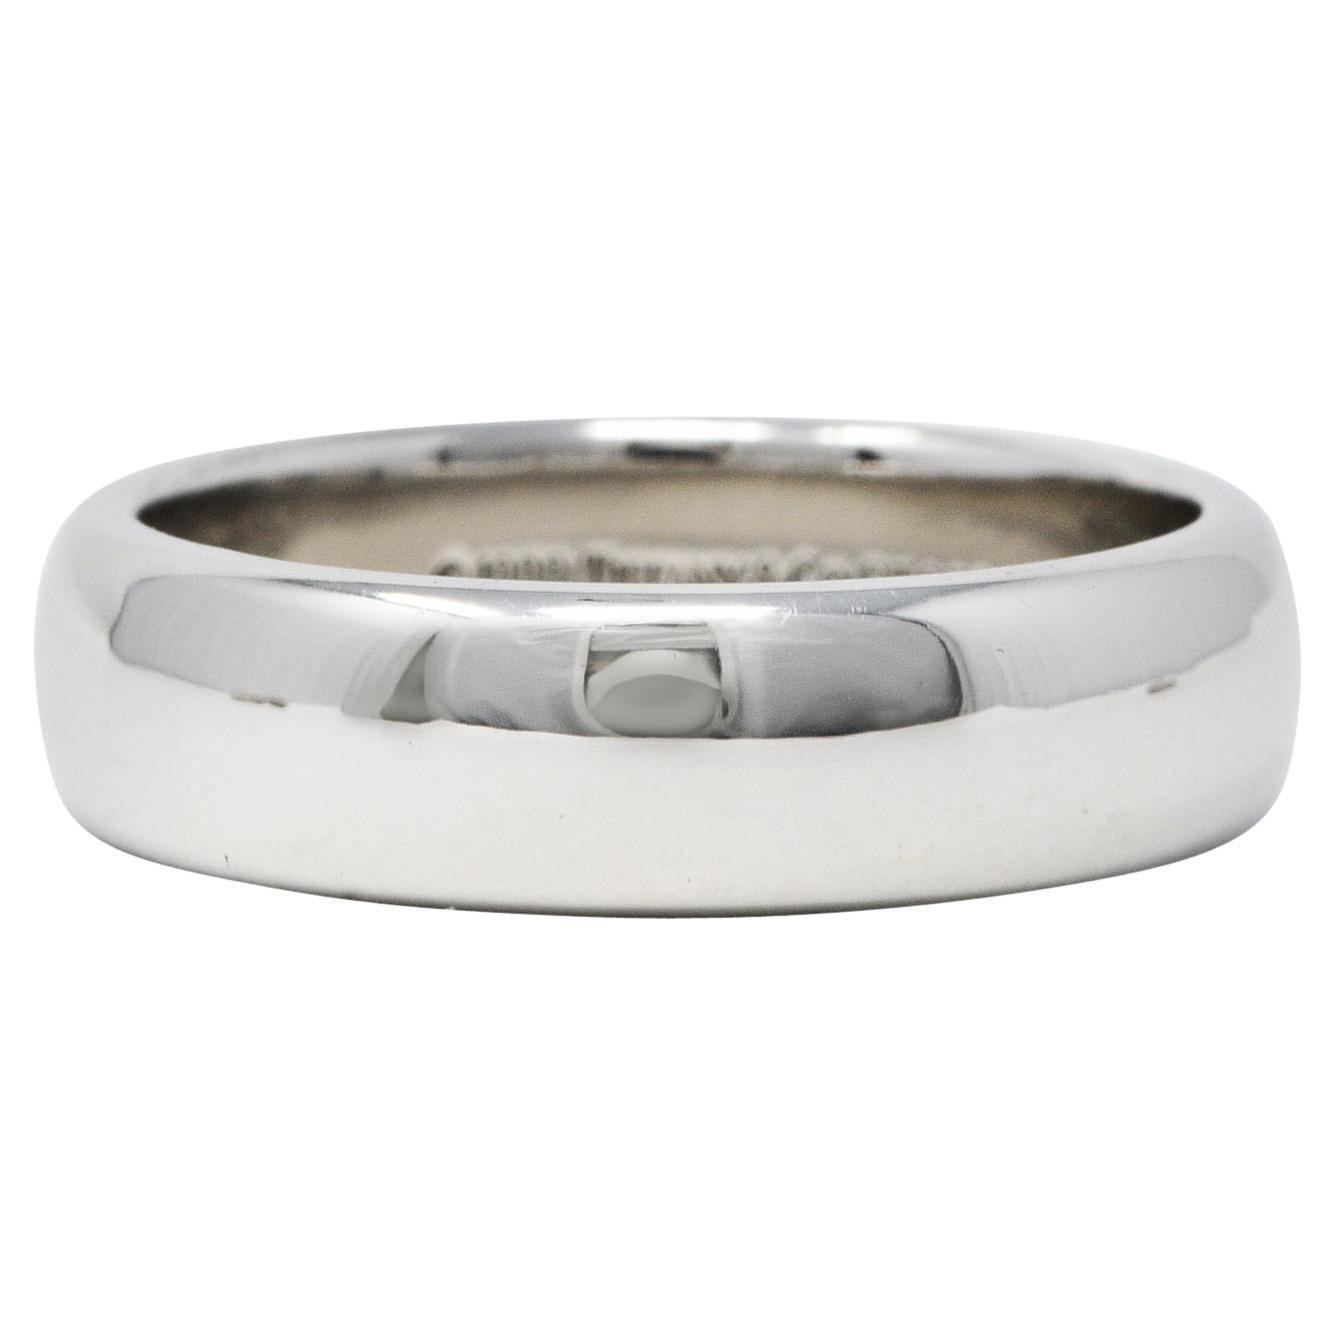 1999 Tiffany & Co. Platinum Men's Wedding Band Ring